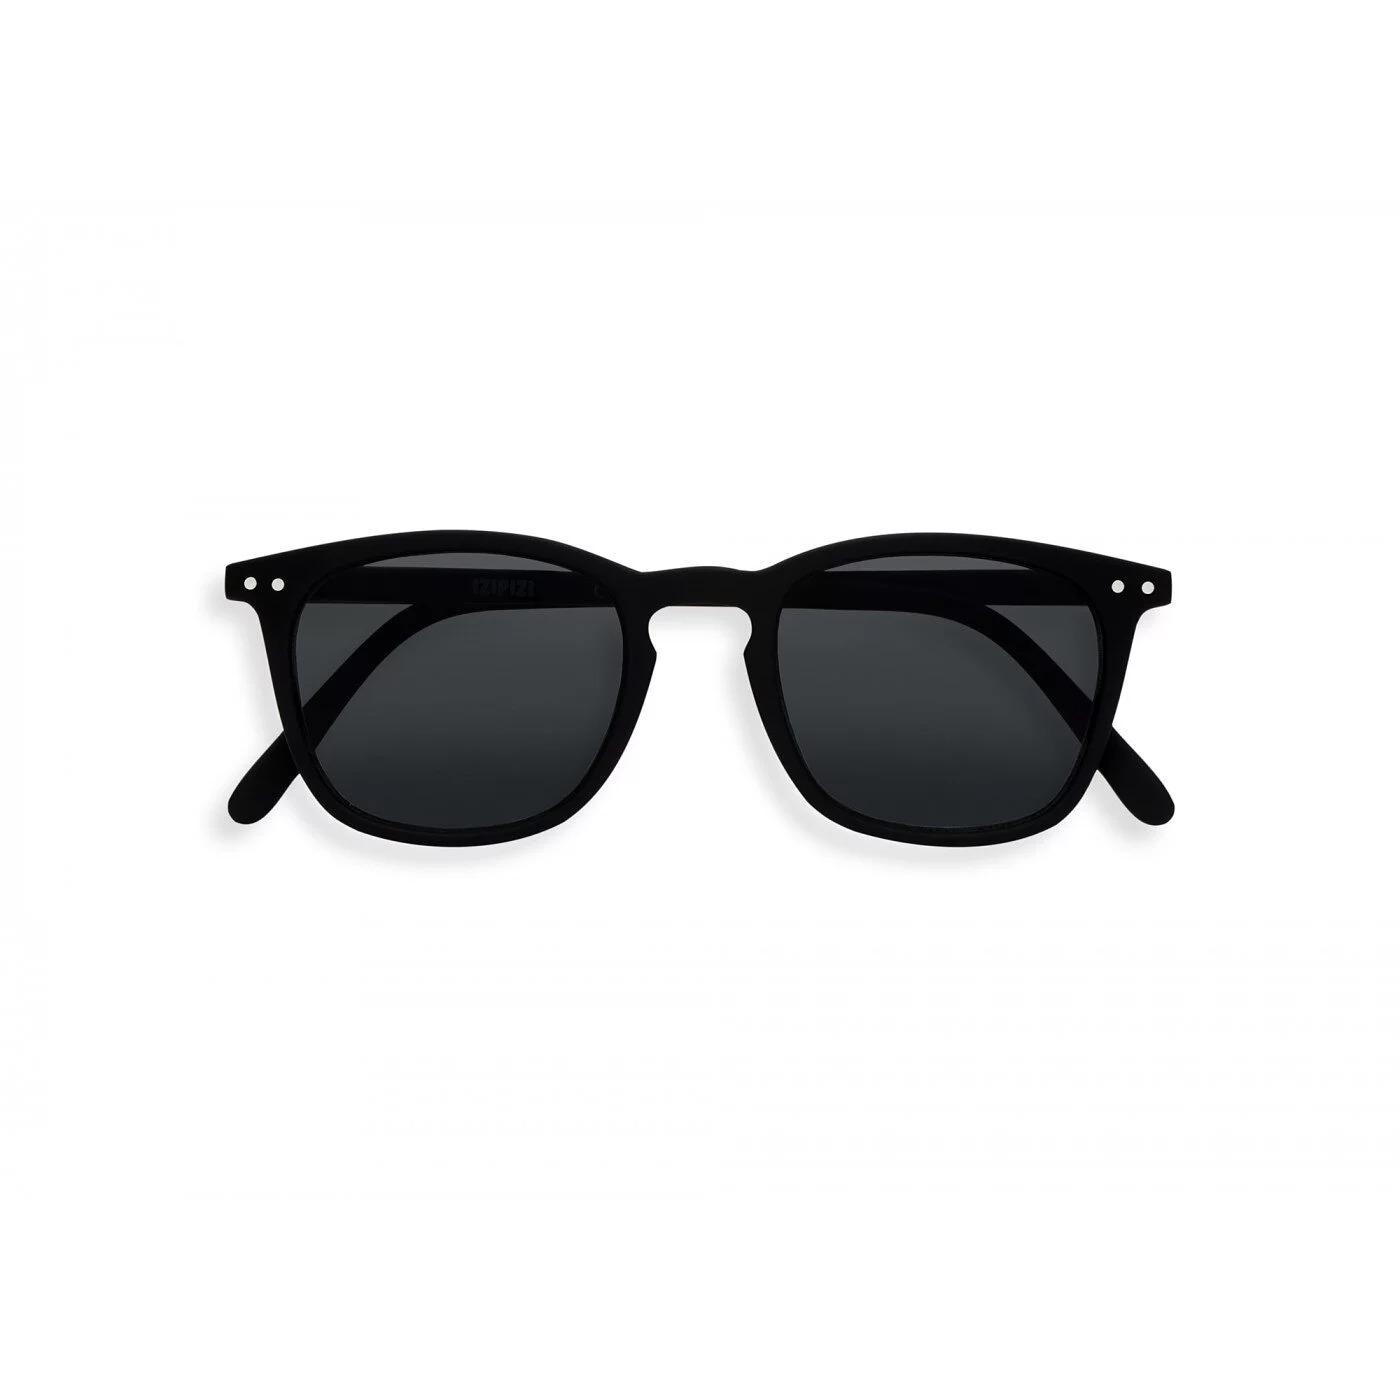 IZIPIZI   #E款 黑/灰色鏡片 方框太陽眼鏡